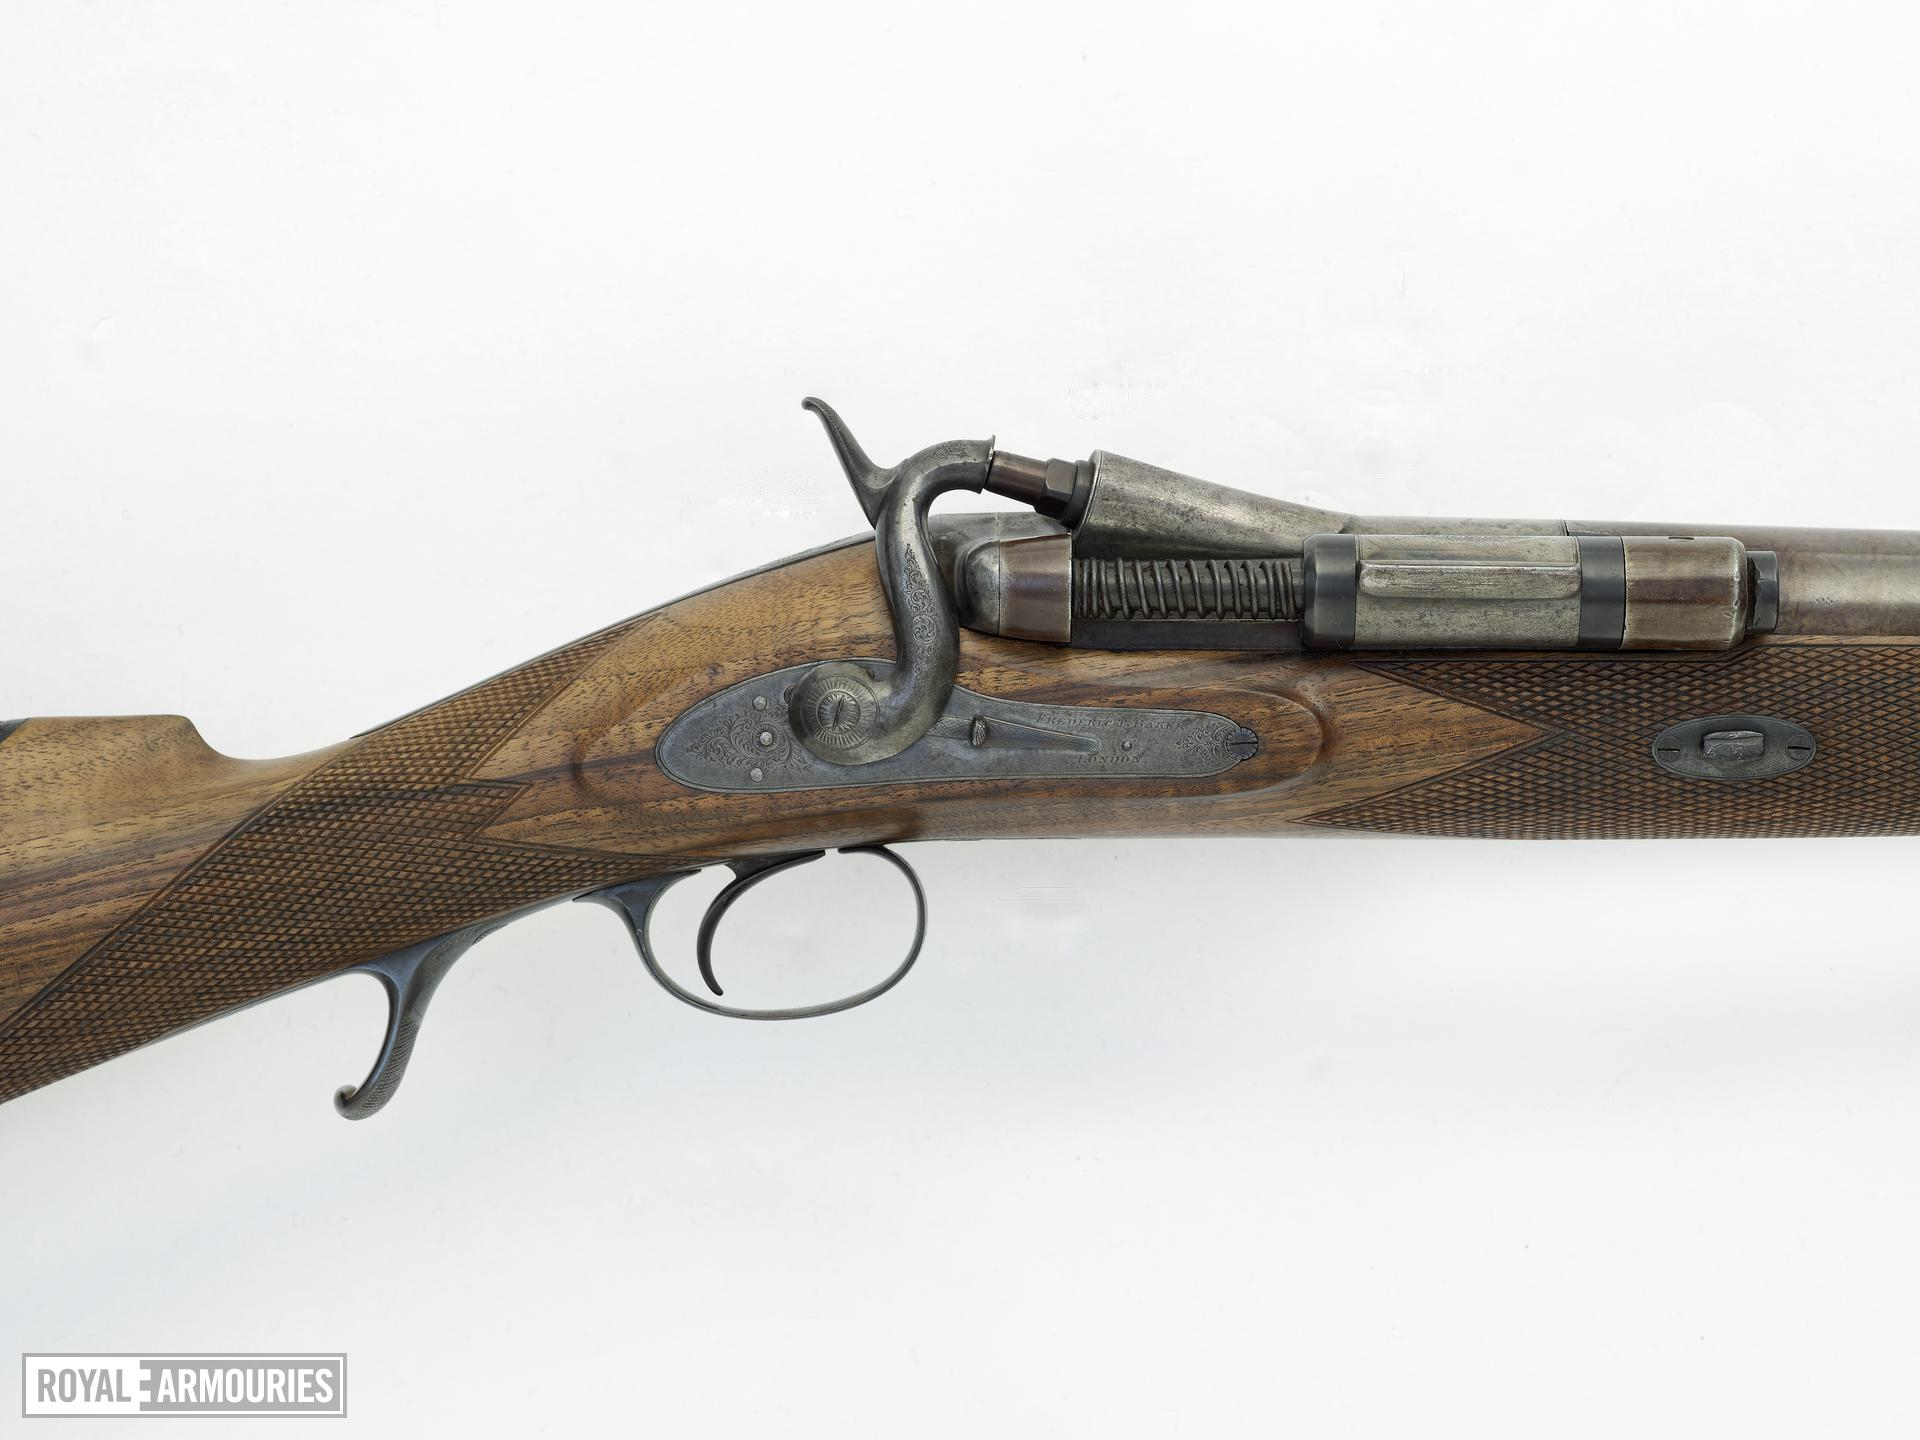 Centrefire breech-loading duck gun - By Frederick Baker